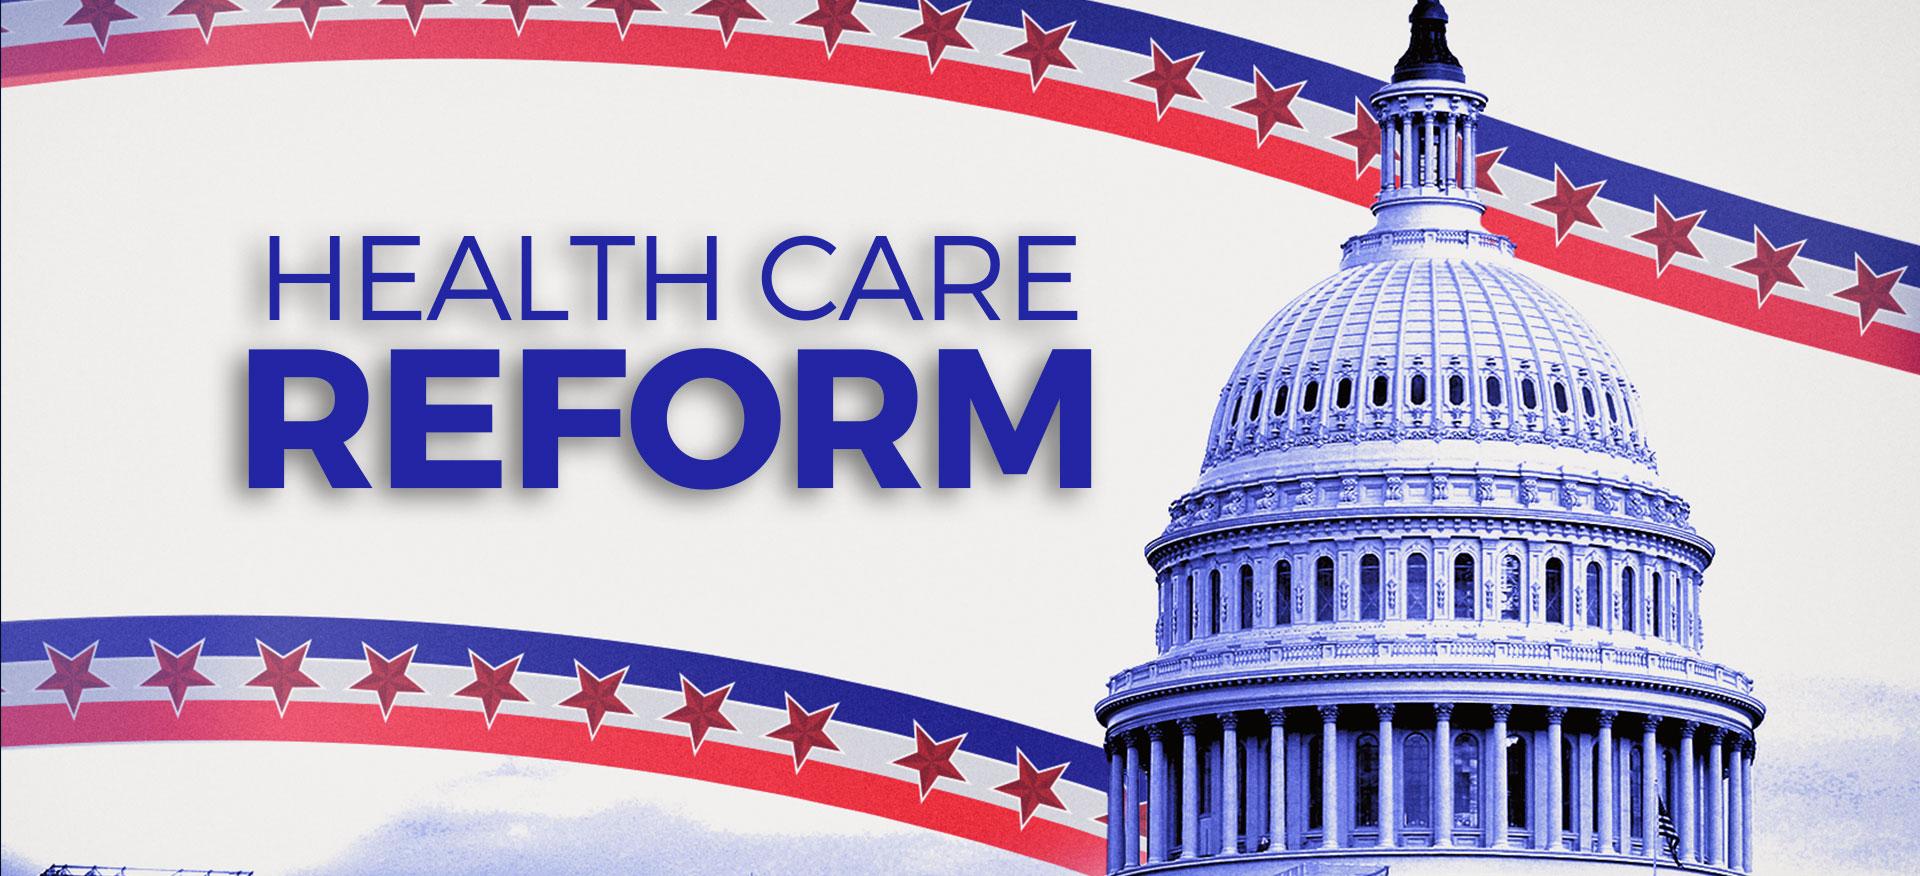 Healthcare Reform Health Care Reform Congress Health Care Plan Congress Healthcare Plan GOP Health Care GOP Healthcare